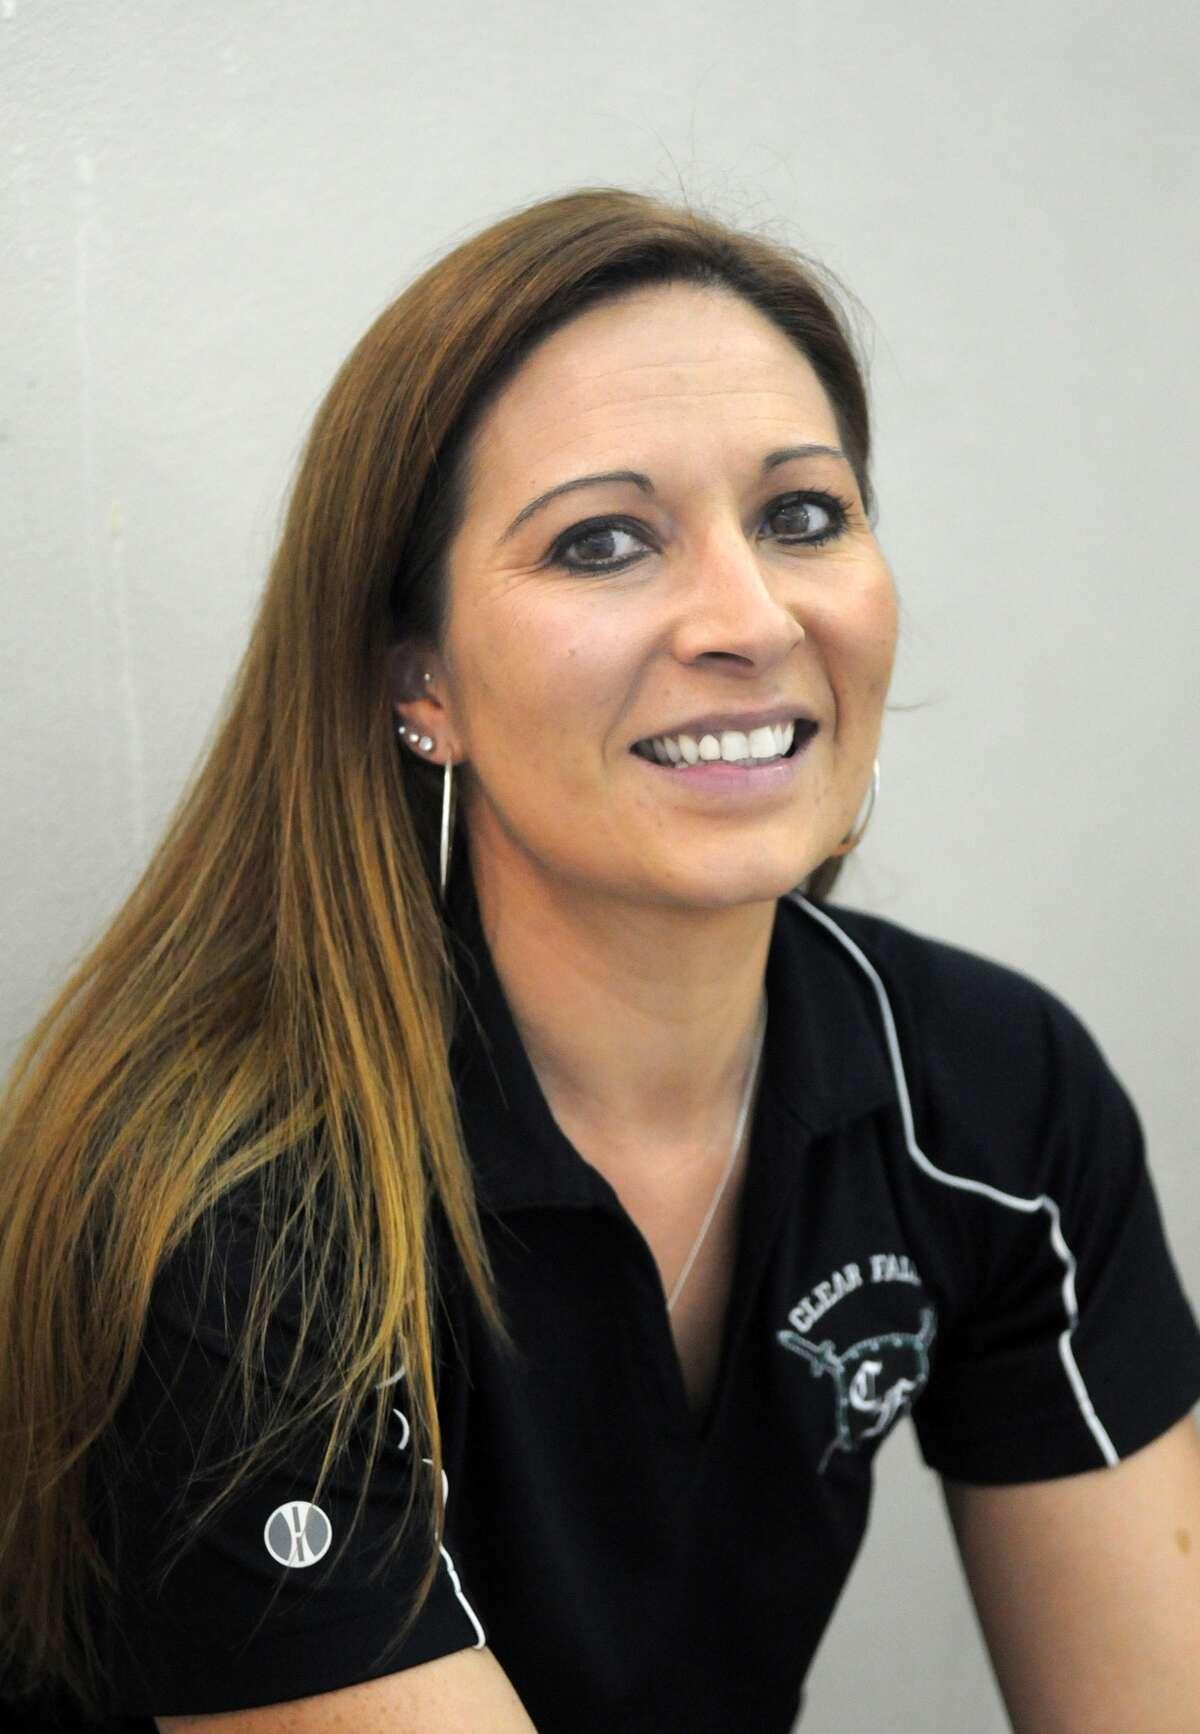 Clear Falls Head Swim Coach Aubrey Estes